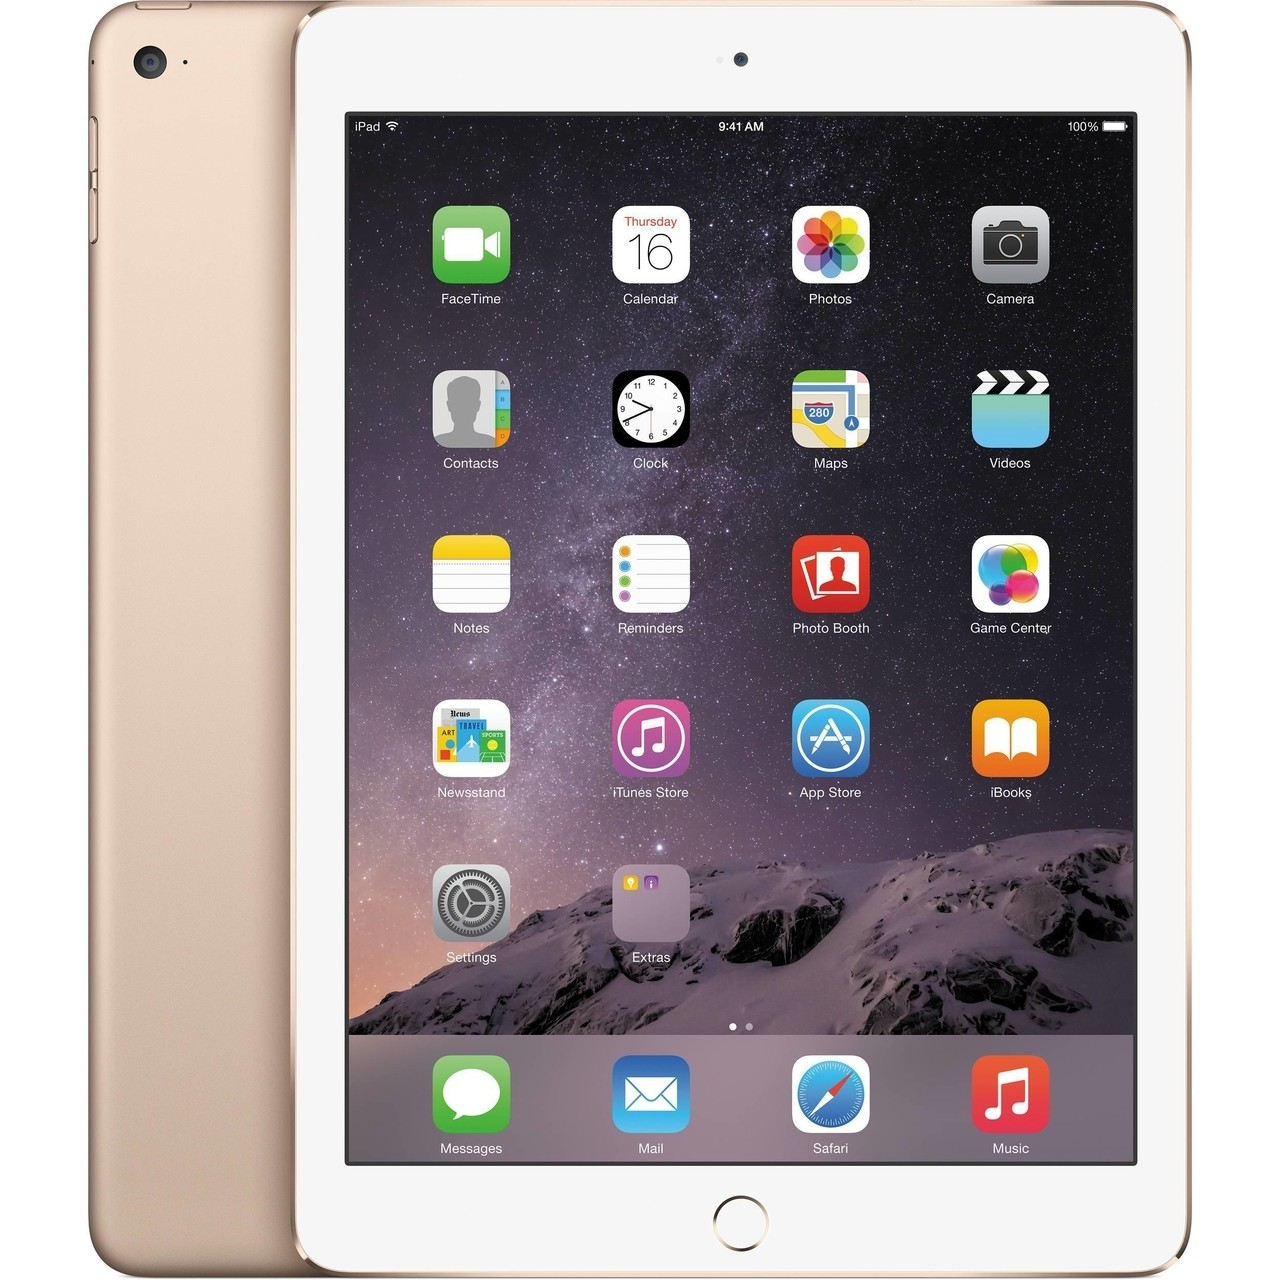 Apple iPad Air 2 - 64GB - Gold - (Retina Display) - B+ Grade Tweedehands